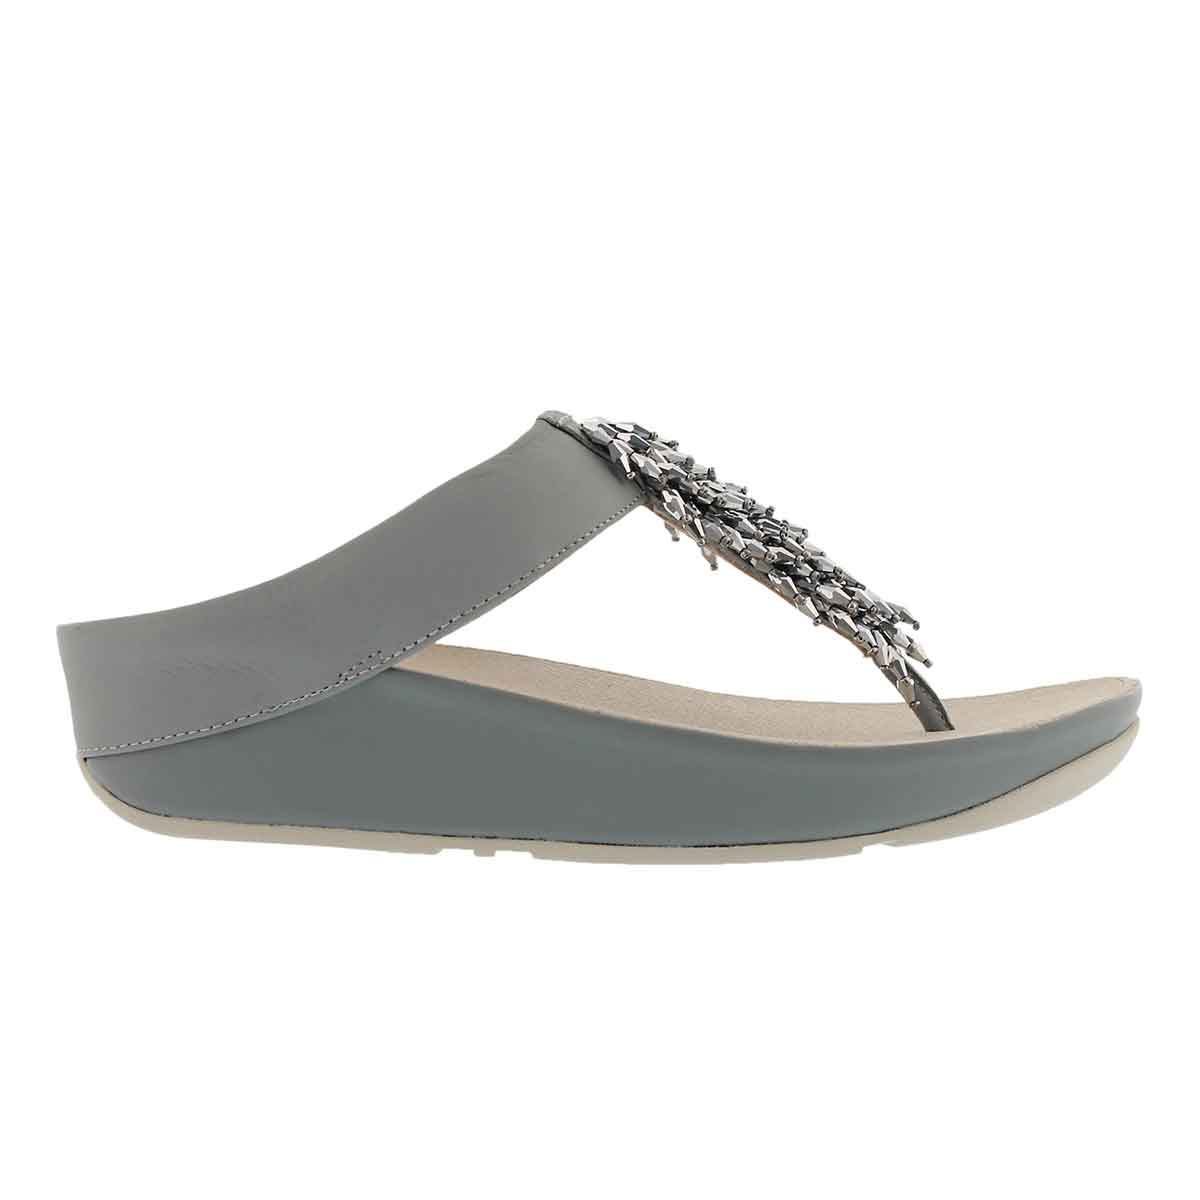 Lds Rumba dove blue fringe thong sandal